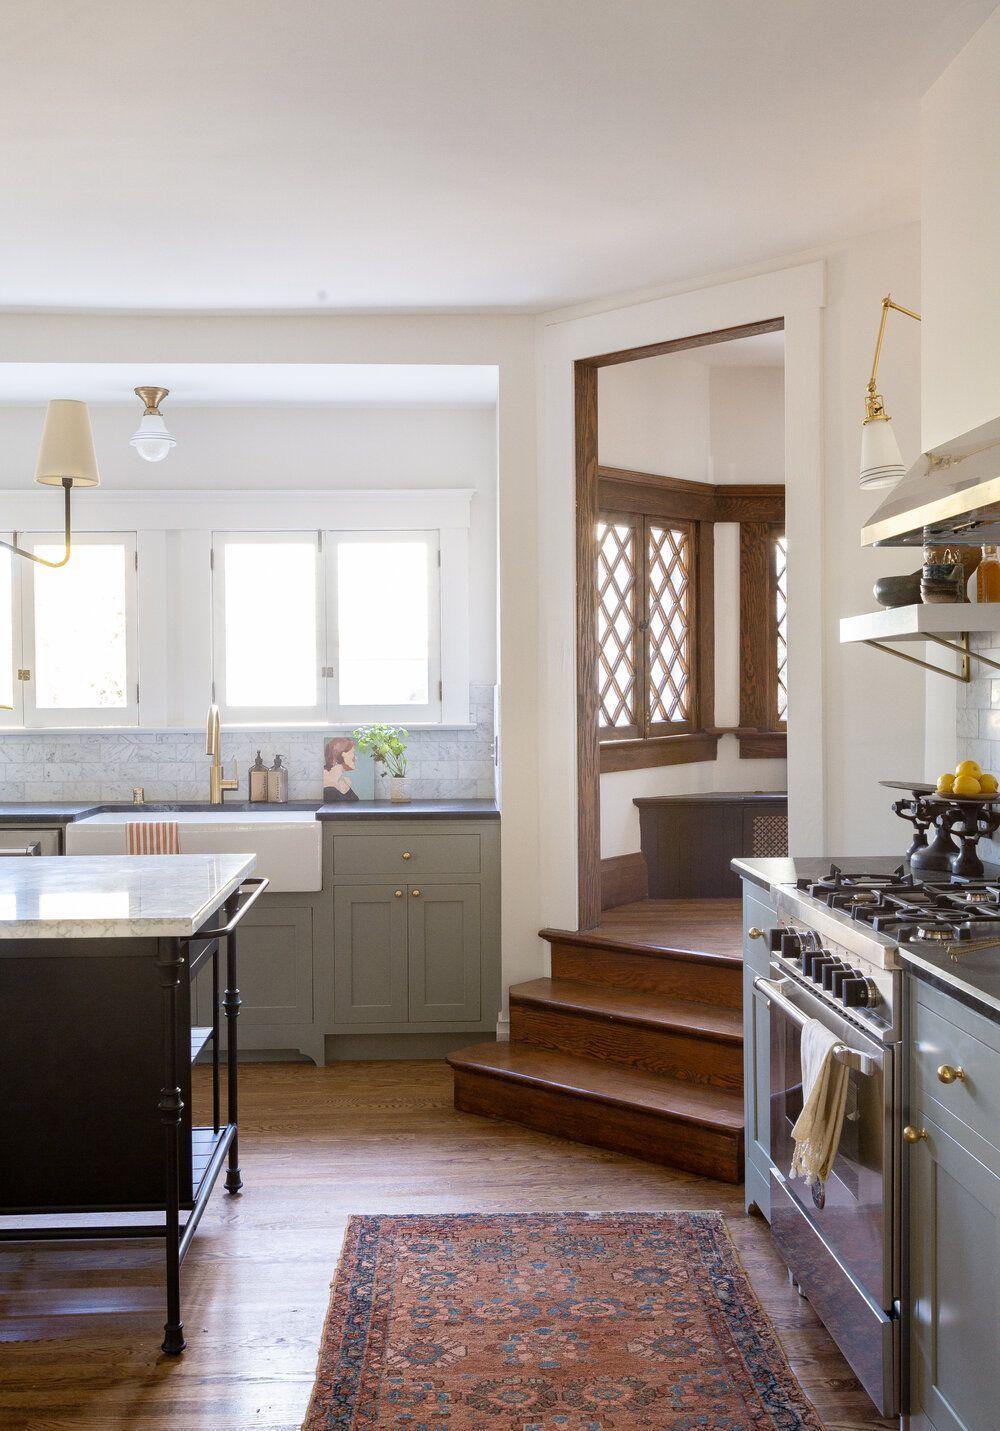 Home Decor Minimalist .Home Decor Minimalist   Home remodeling ...